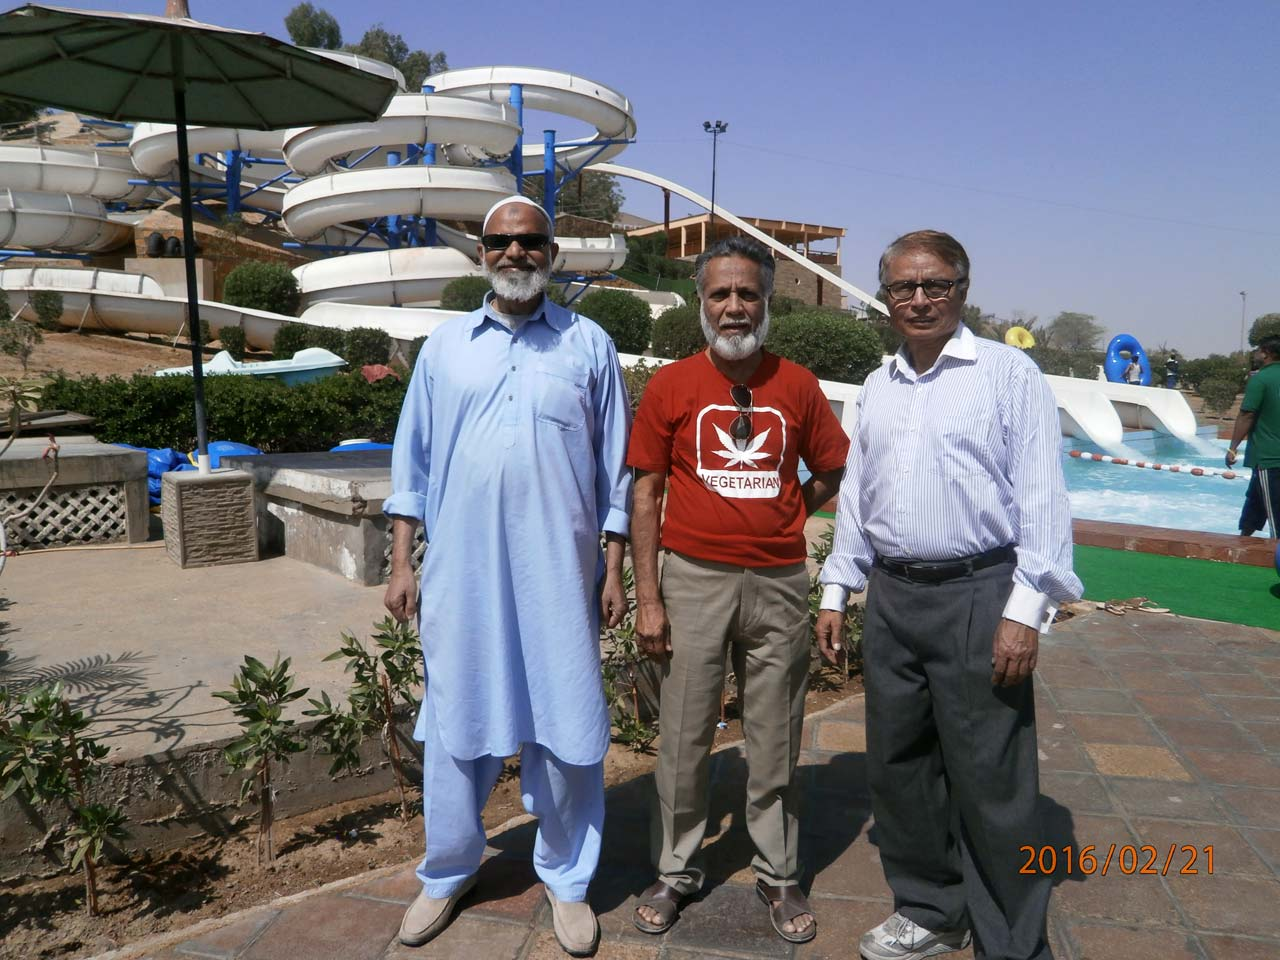 Alimullah, Shahid Qadri, Muzafar Ali Khan